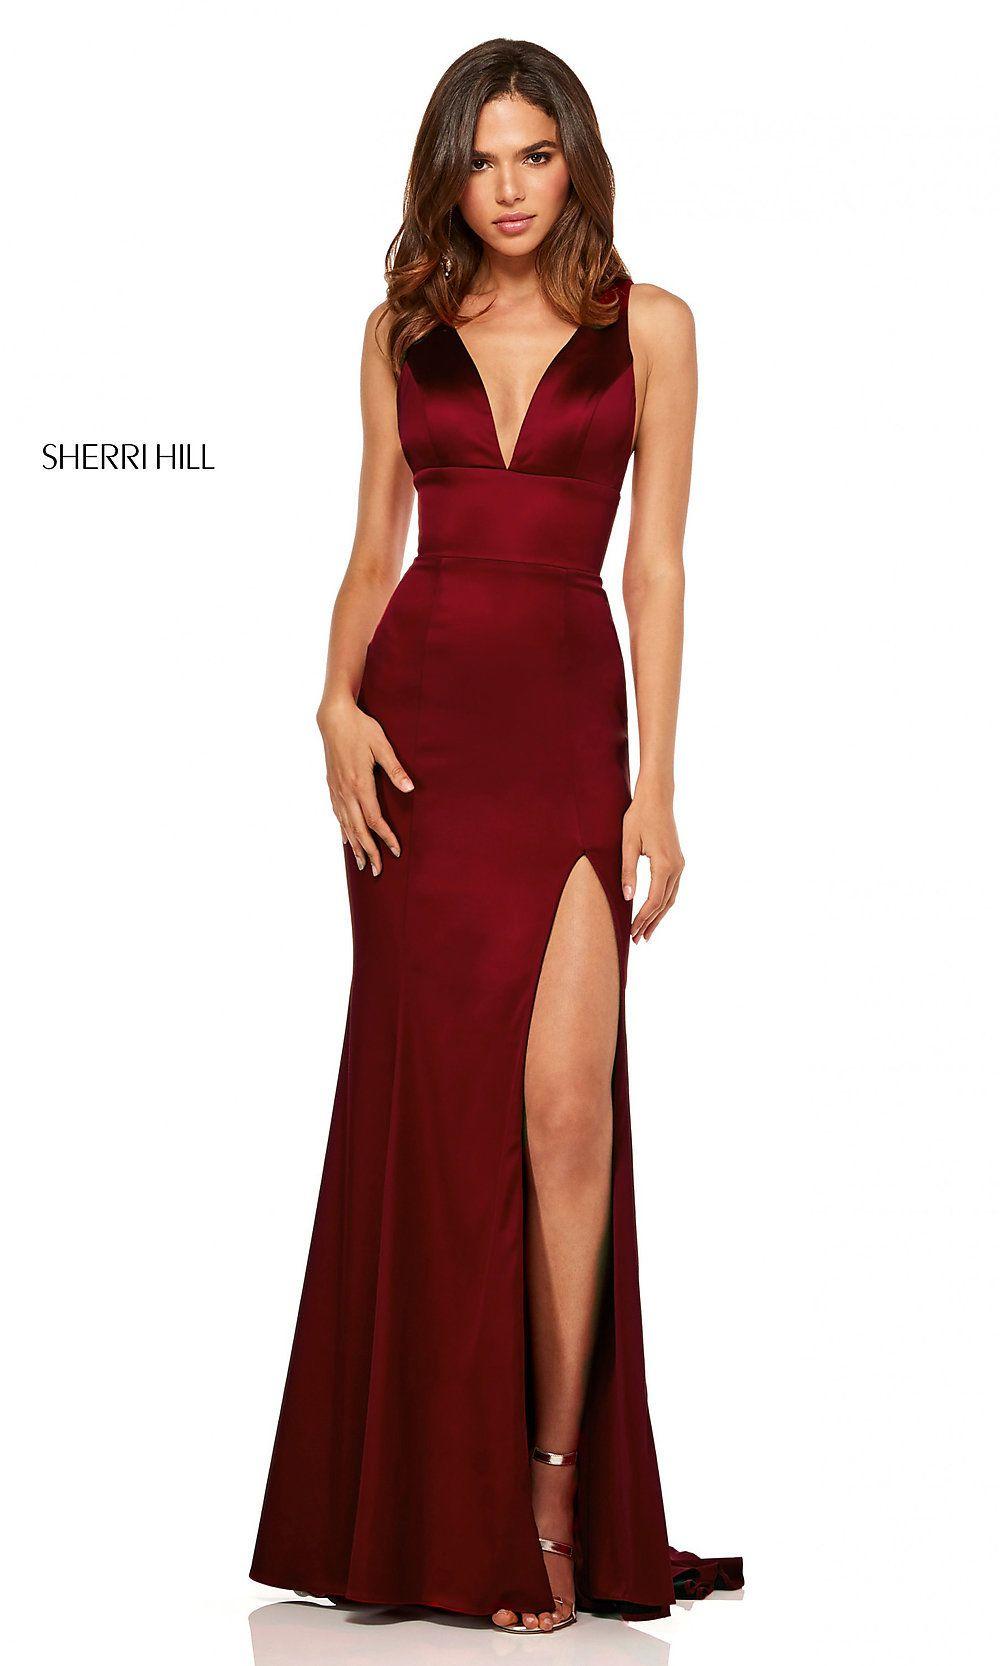 f23396c026f V-Neck Long Side-Slit Prom Dress by Sherri Hill in 2019